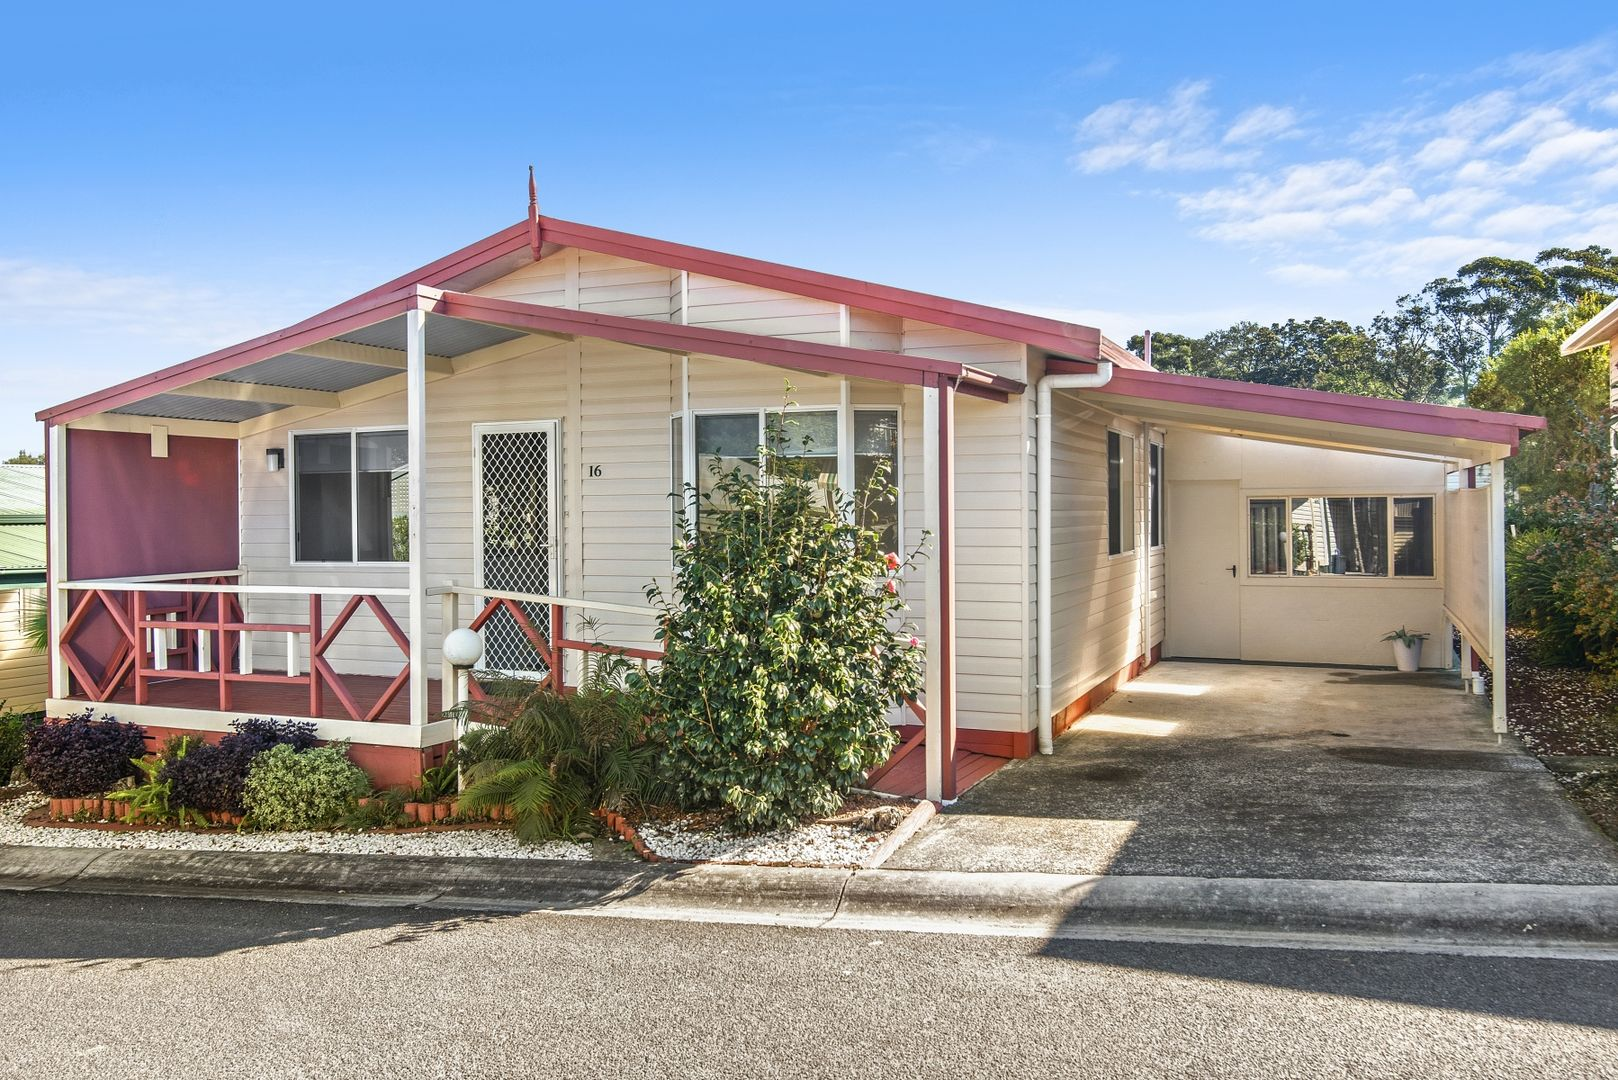 16 Arthur Phillip Drive, Kincumber NSW 2251, Image 0